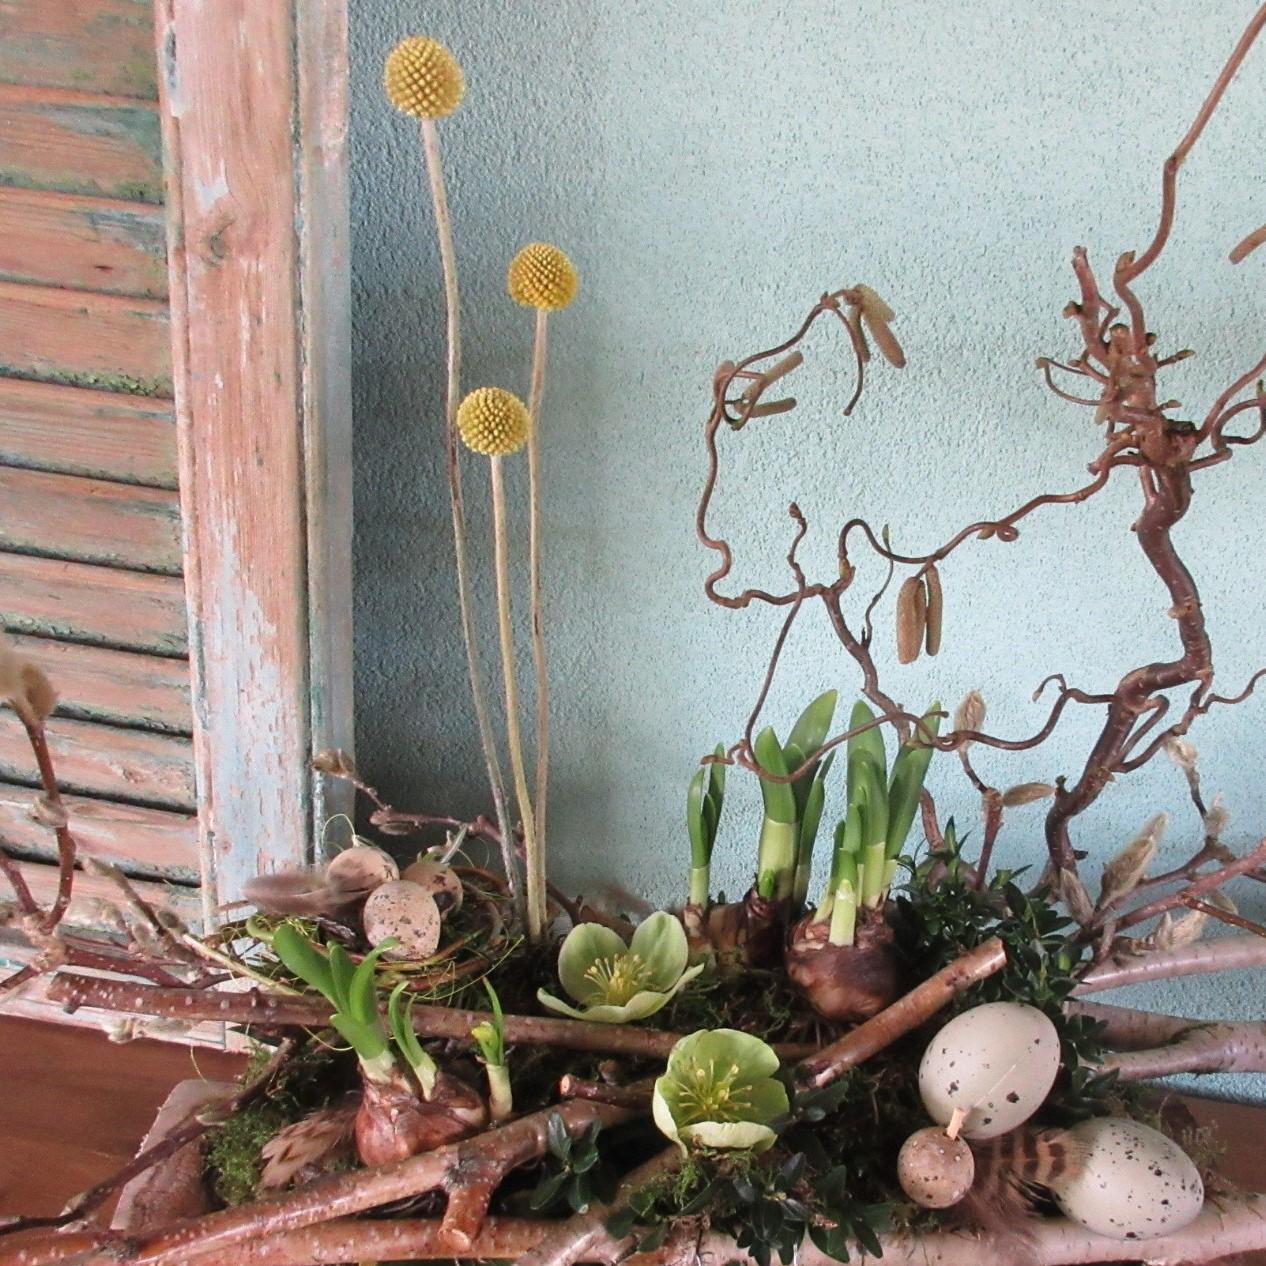 Haal het voorjaar in huis met dit riante bloemstuk